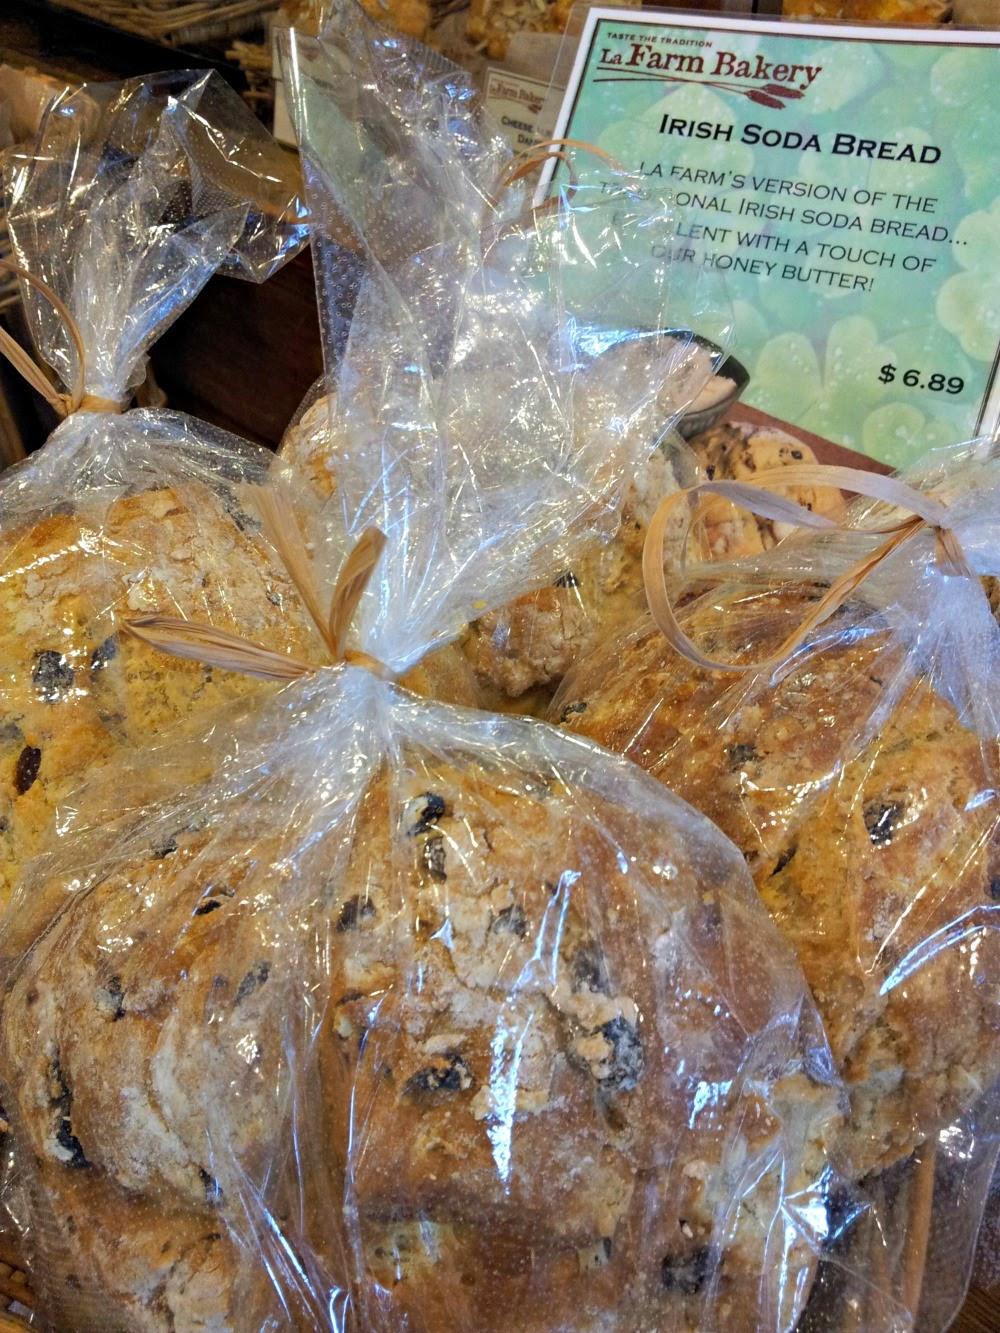 Irish Soda Bread sold at LaFarm Bakery in Cary, N.C.